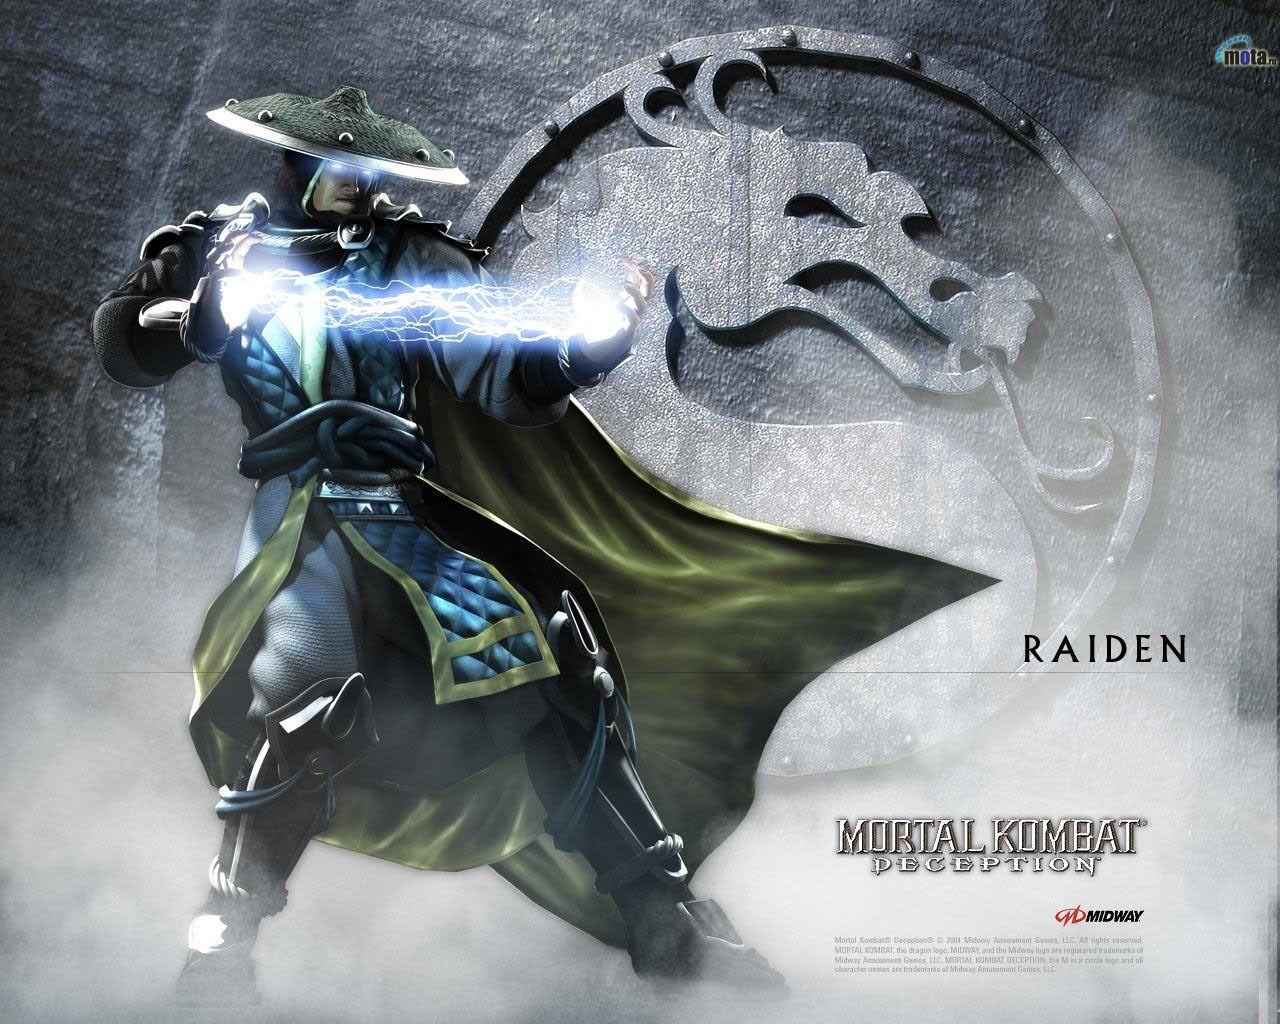 1280x1024 Full Size Mortal Kombat Raiden Mortal Kombat Mortal Kombat X Wallpapers Mortal Kombat Characters